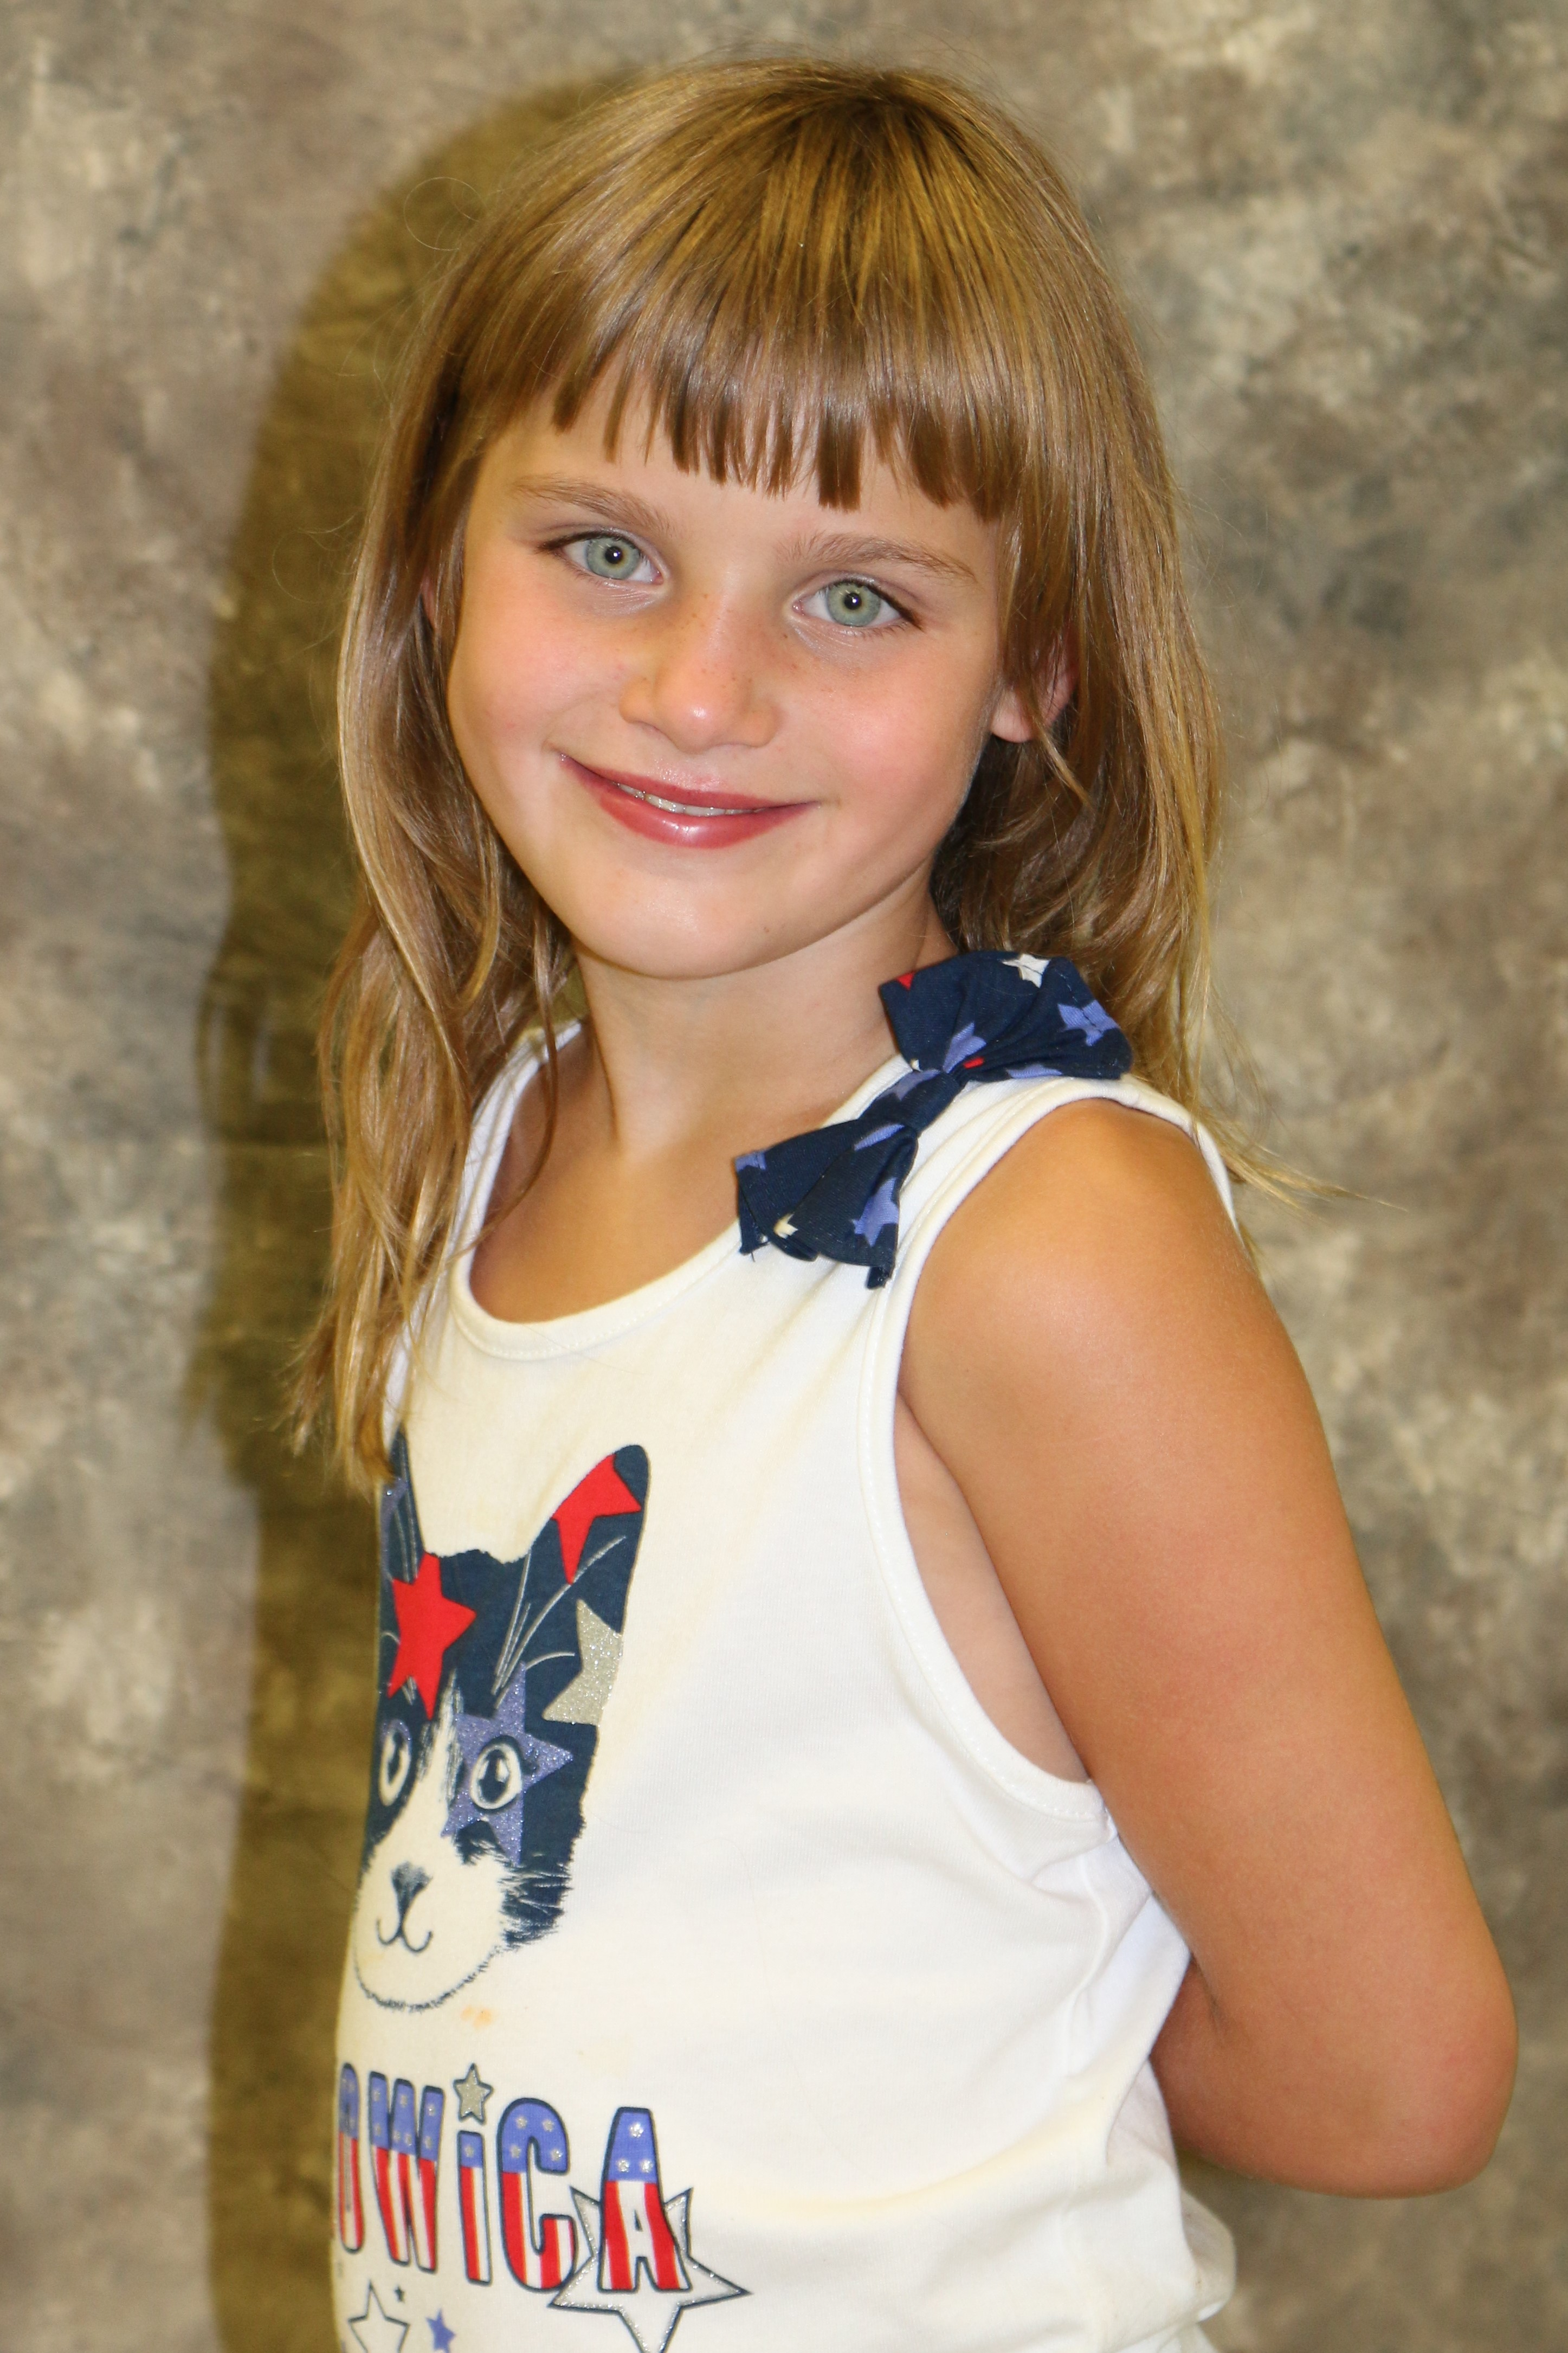 Little Miss Contestant - Marjorie Stock 8